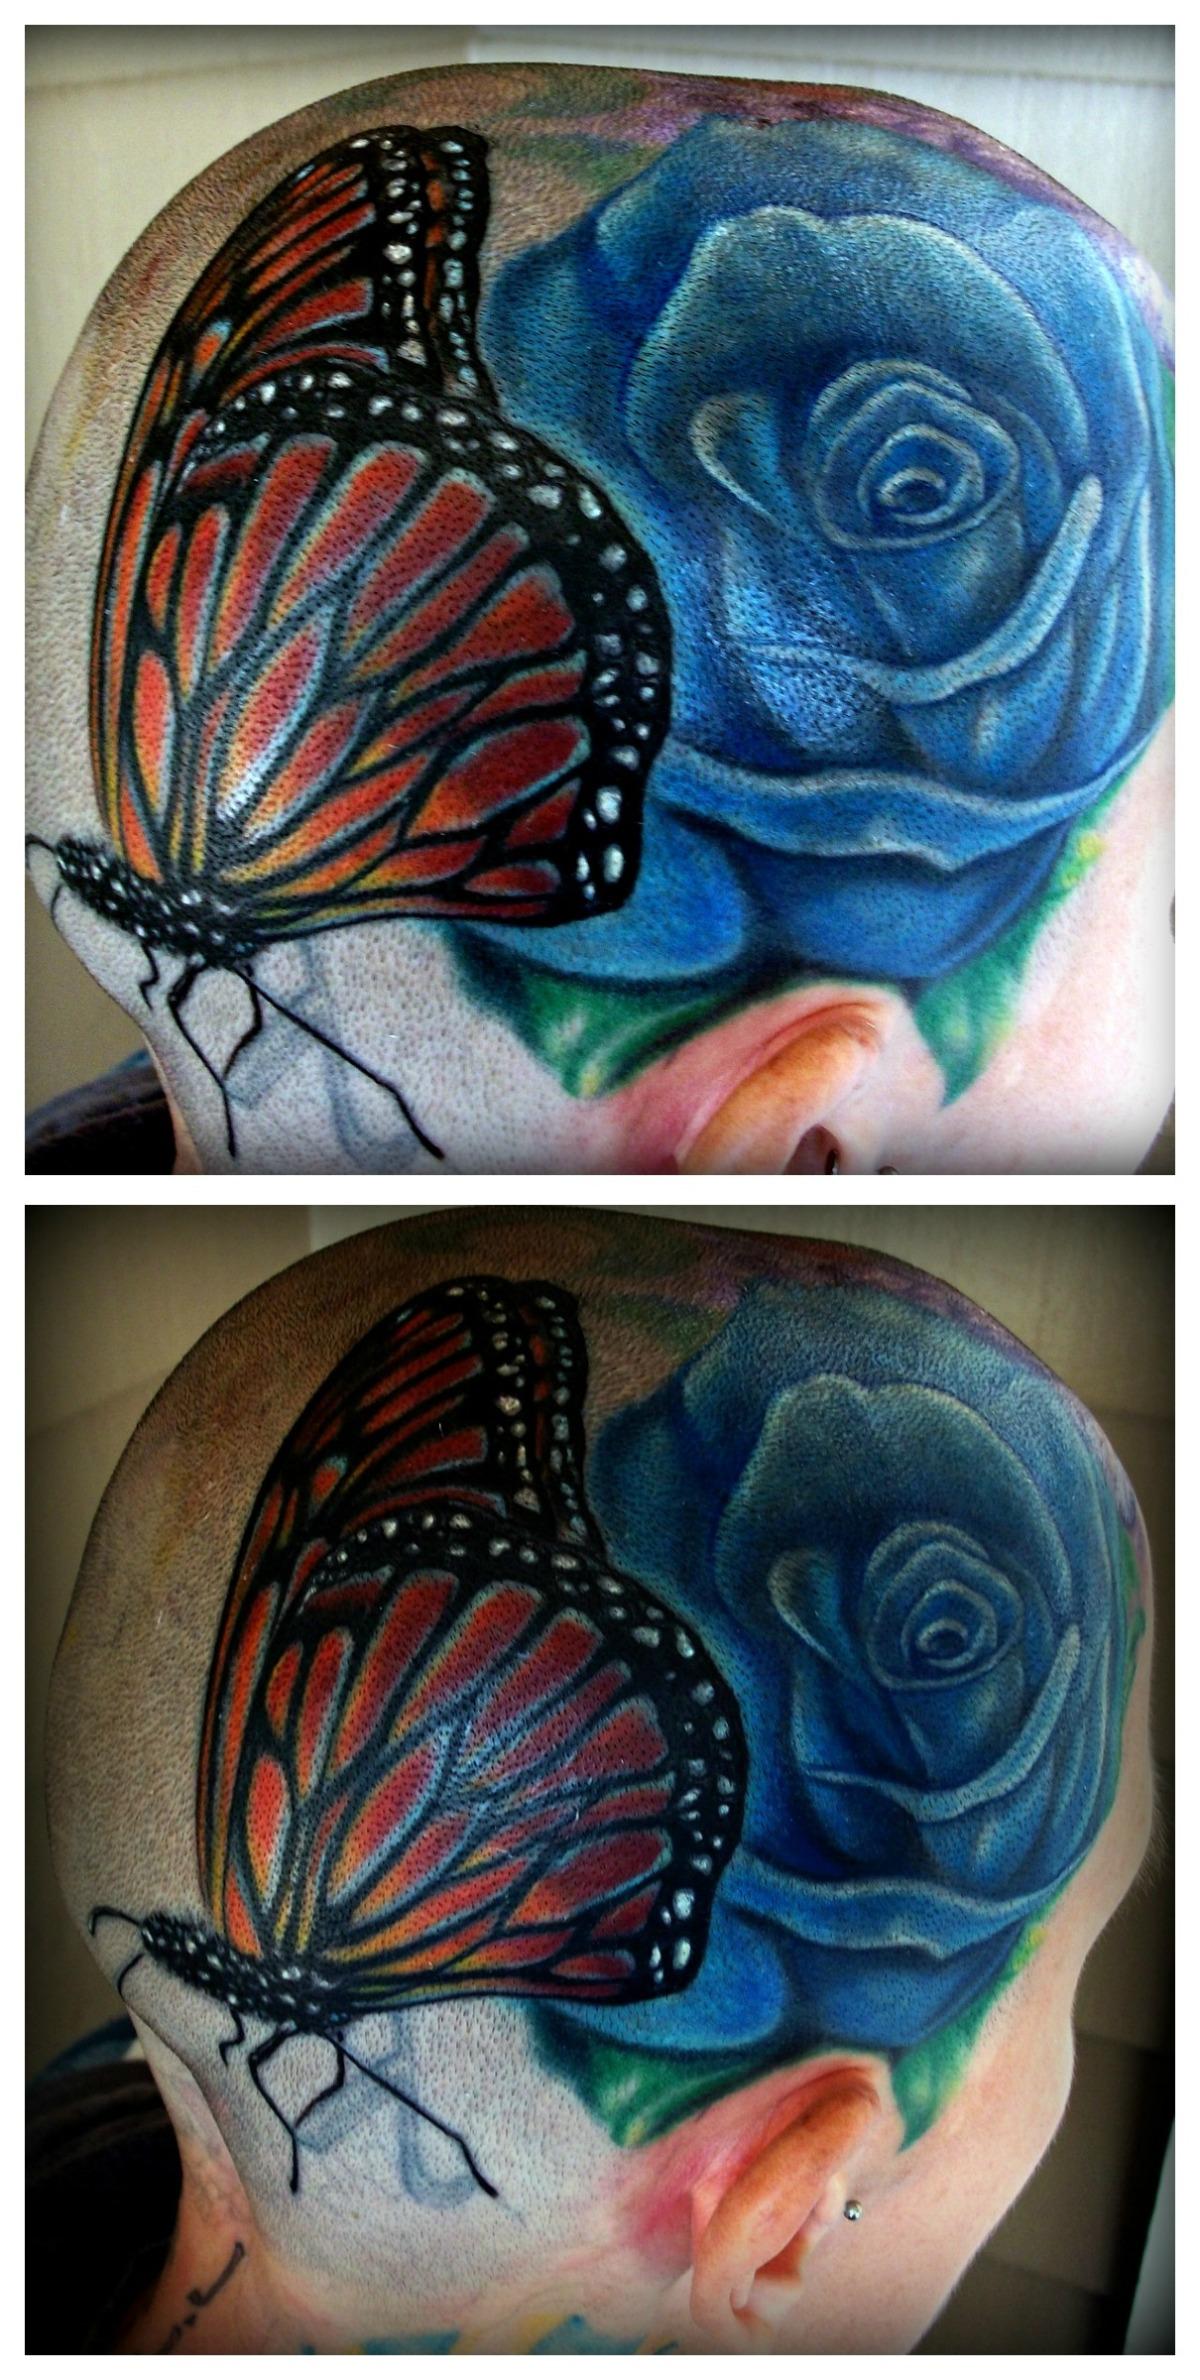 An interview with jinxi part ii tam blog for Tattoo artist magazine download